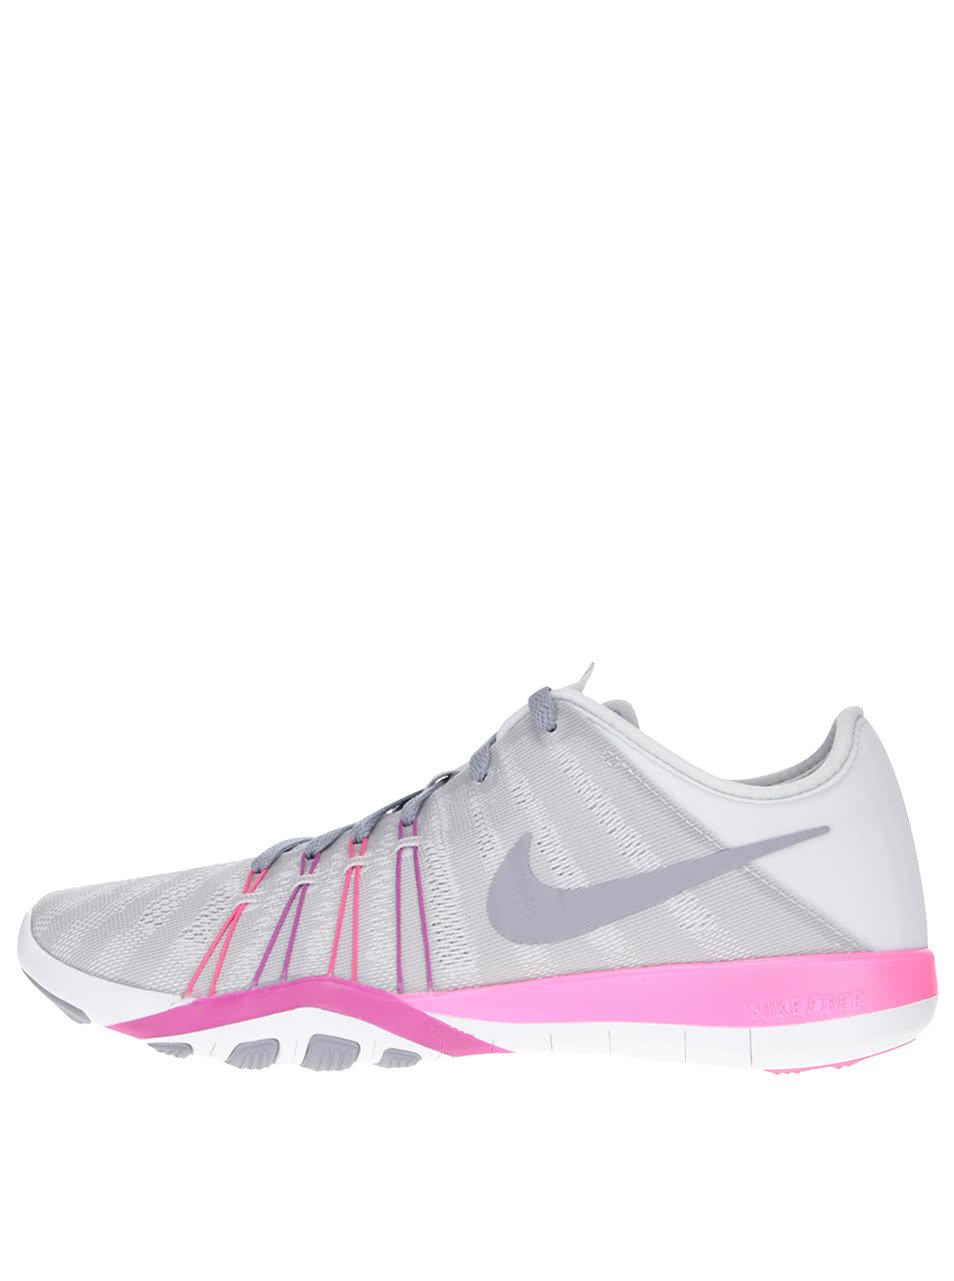 f45520d41 Sivo-ružové dámske tenisky Nike Free 7 | ZOOT.sk